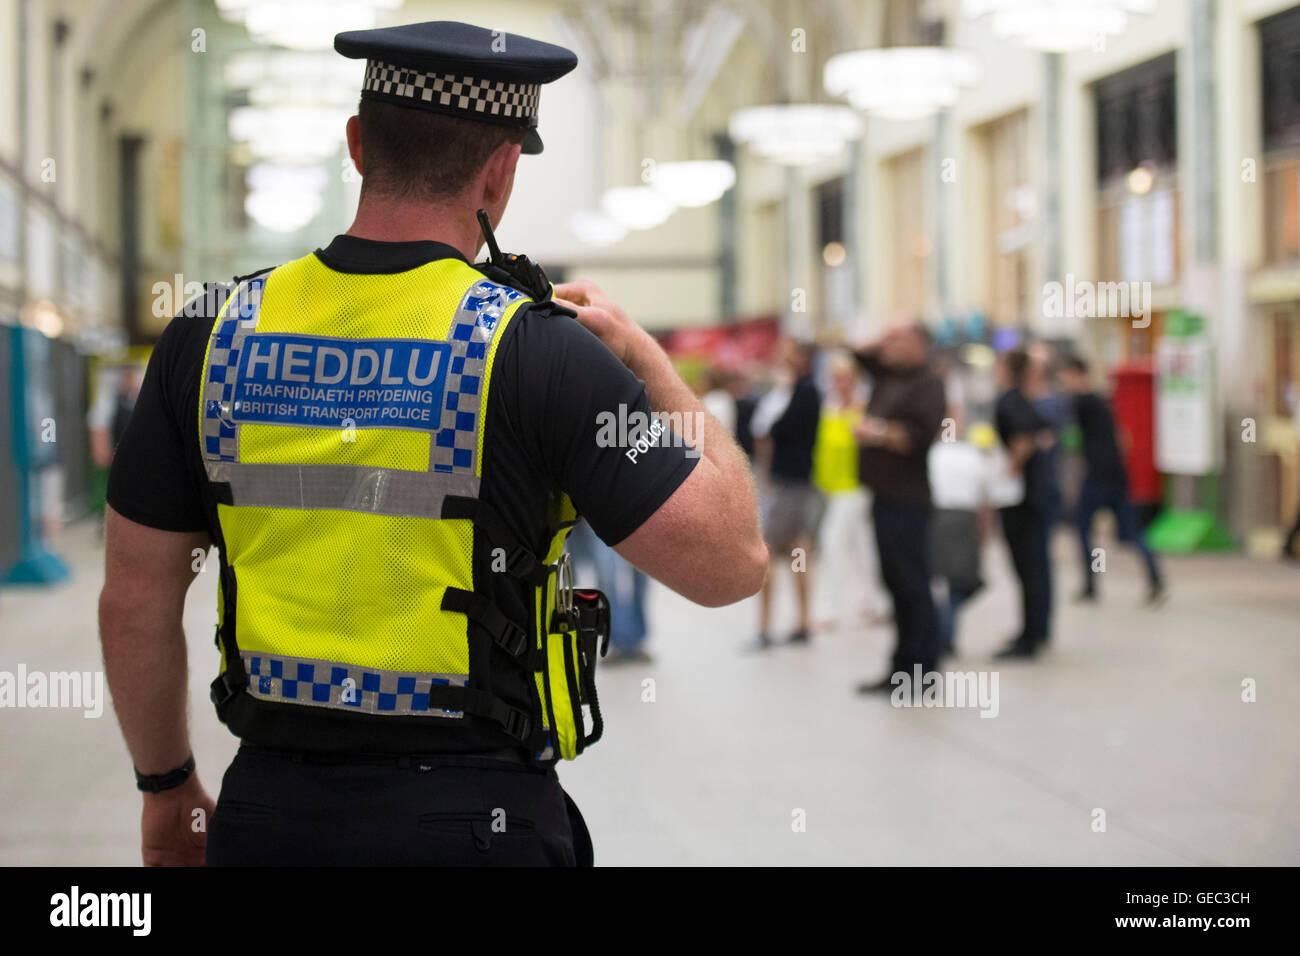 British Transport Police (BTP) a Cardiff stazione ferroviaria stazione ferroviaria a Cardiff, nel Galles, UK. Immagini Stock